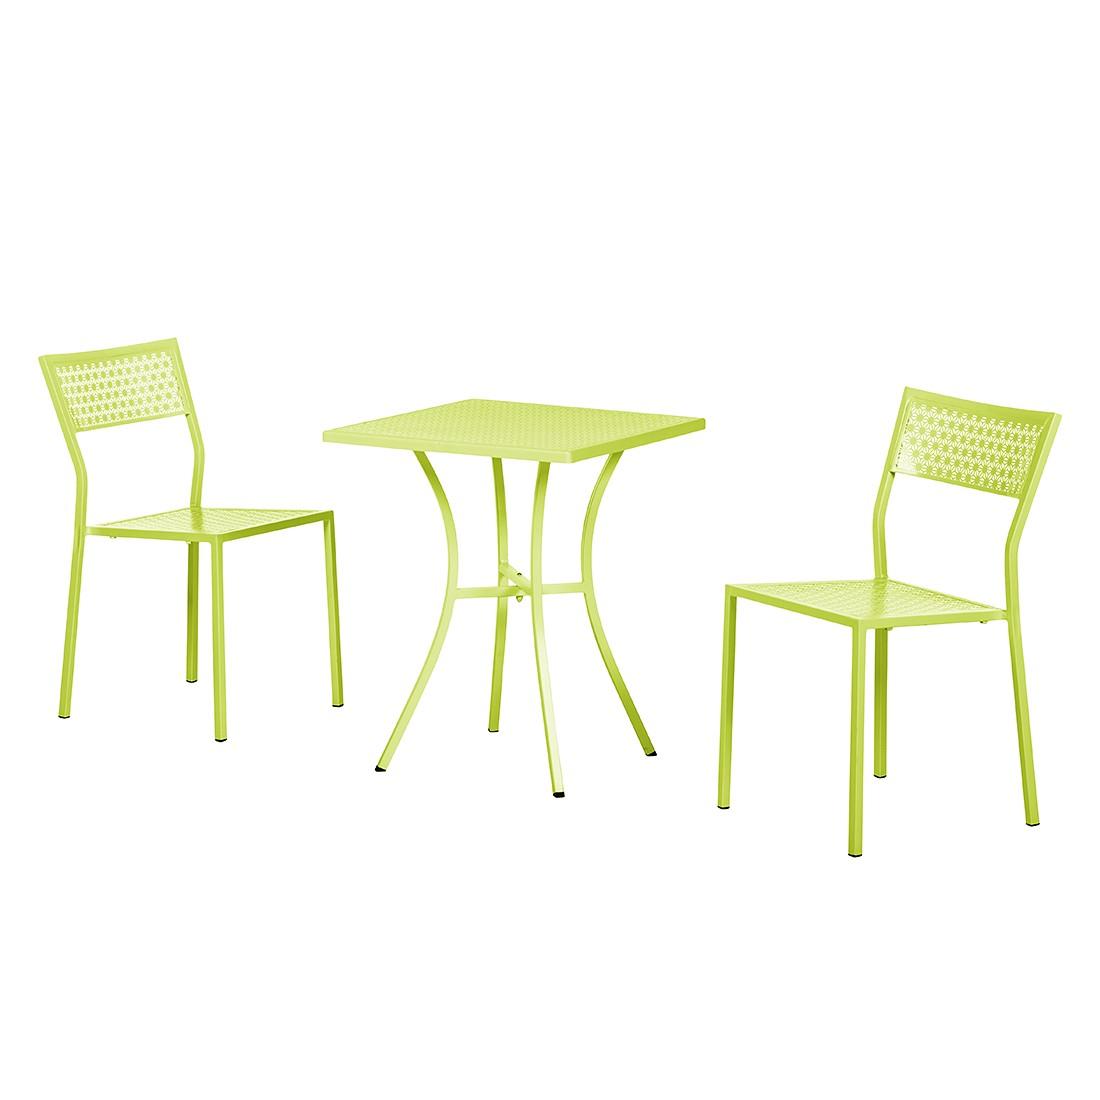 Balkonmöbelset Pini (3-teilig) - Stahl Hellgrün, Garden Guerilla